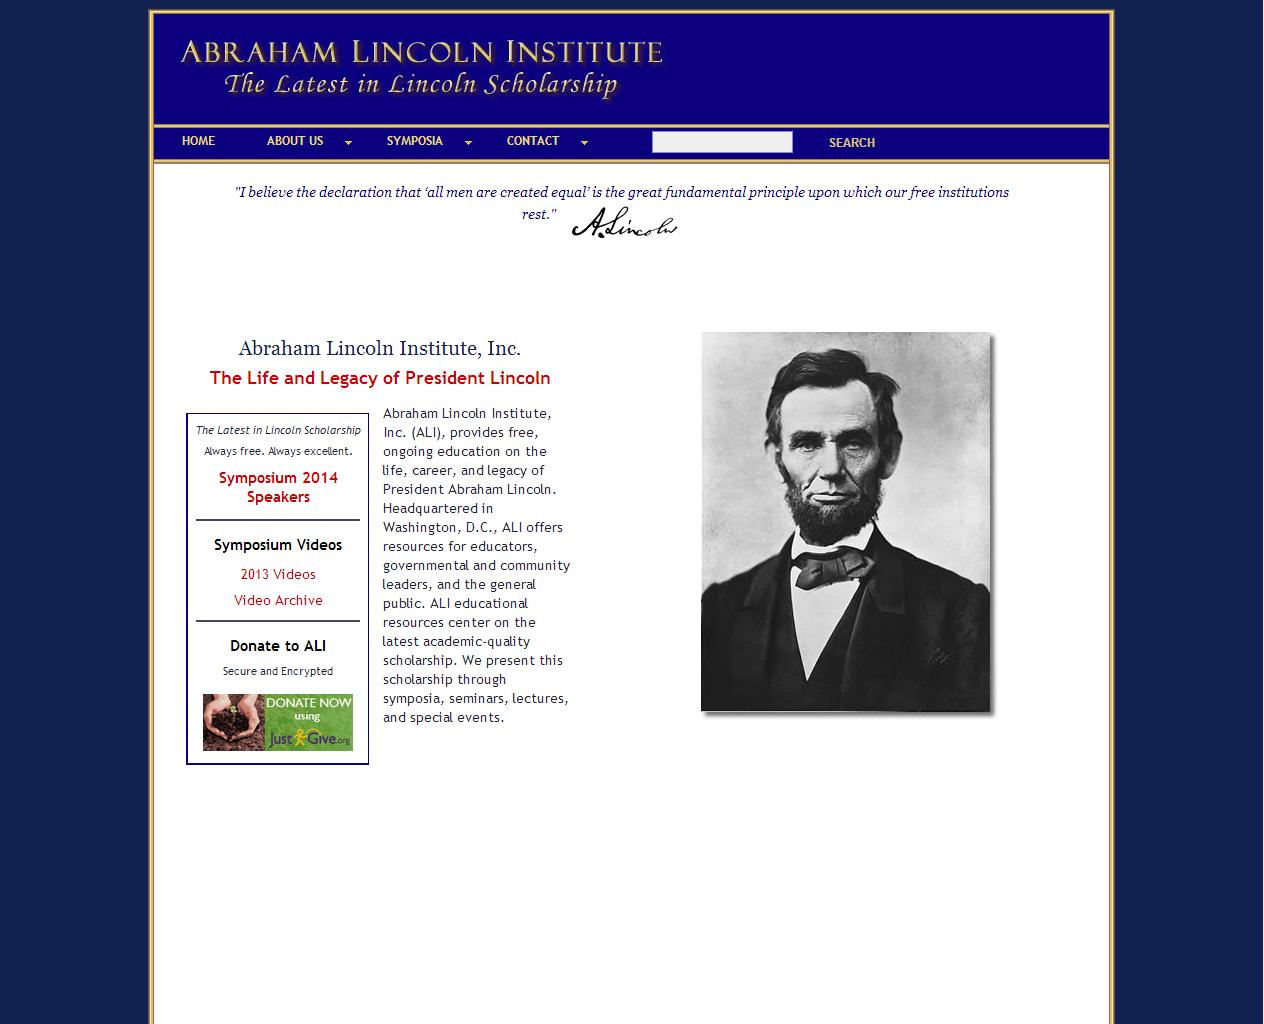 Abraham Lincoln Institute